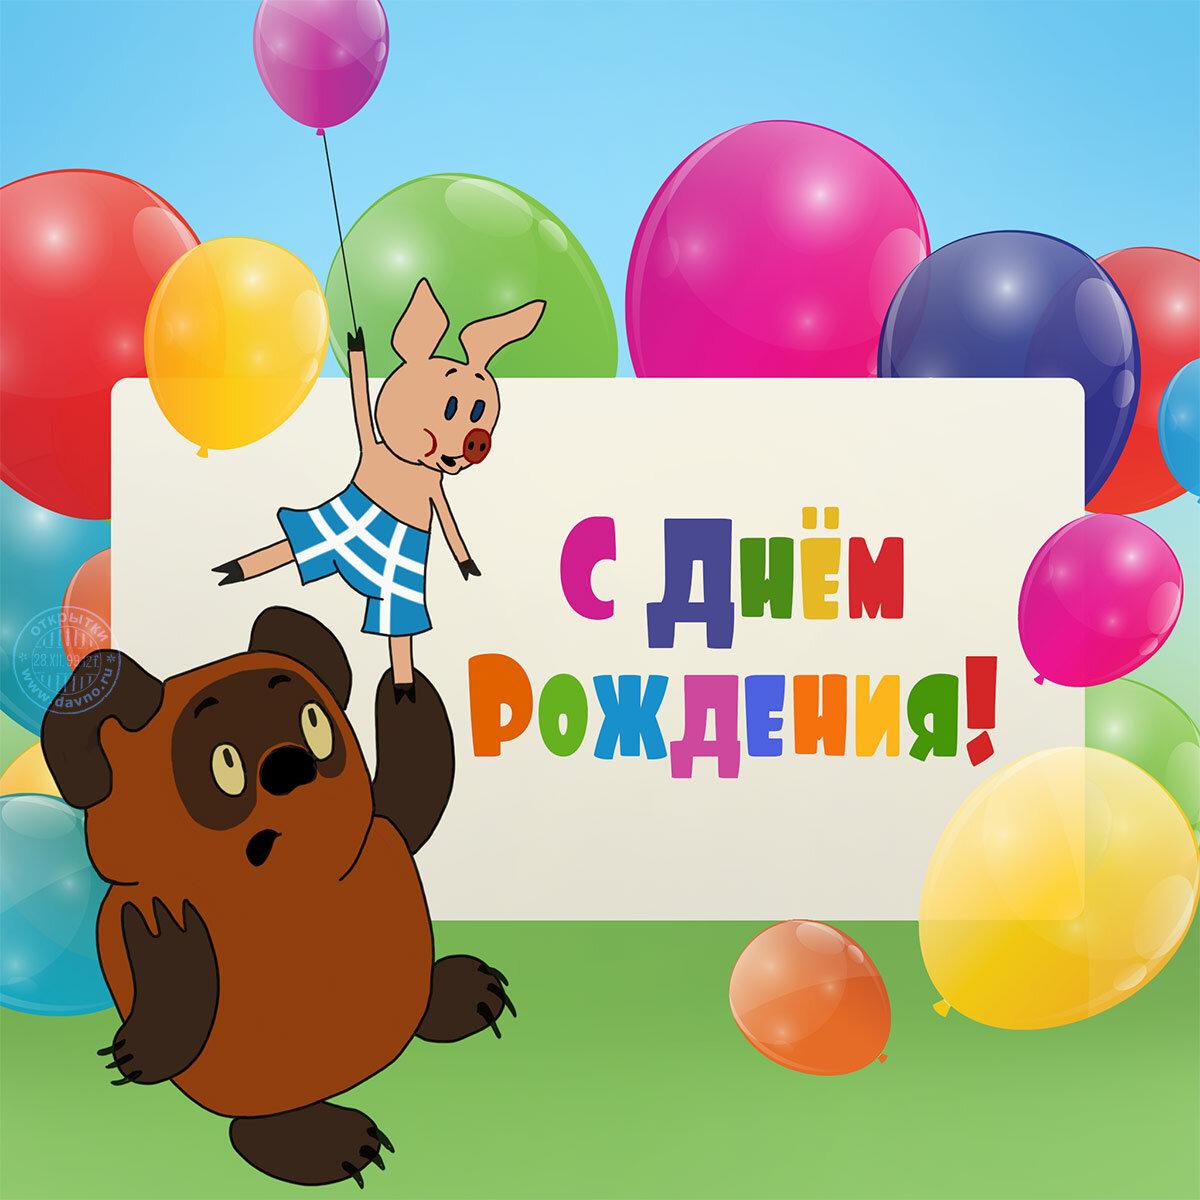 З днем народження открытка для детей, для